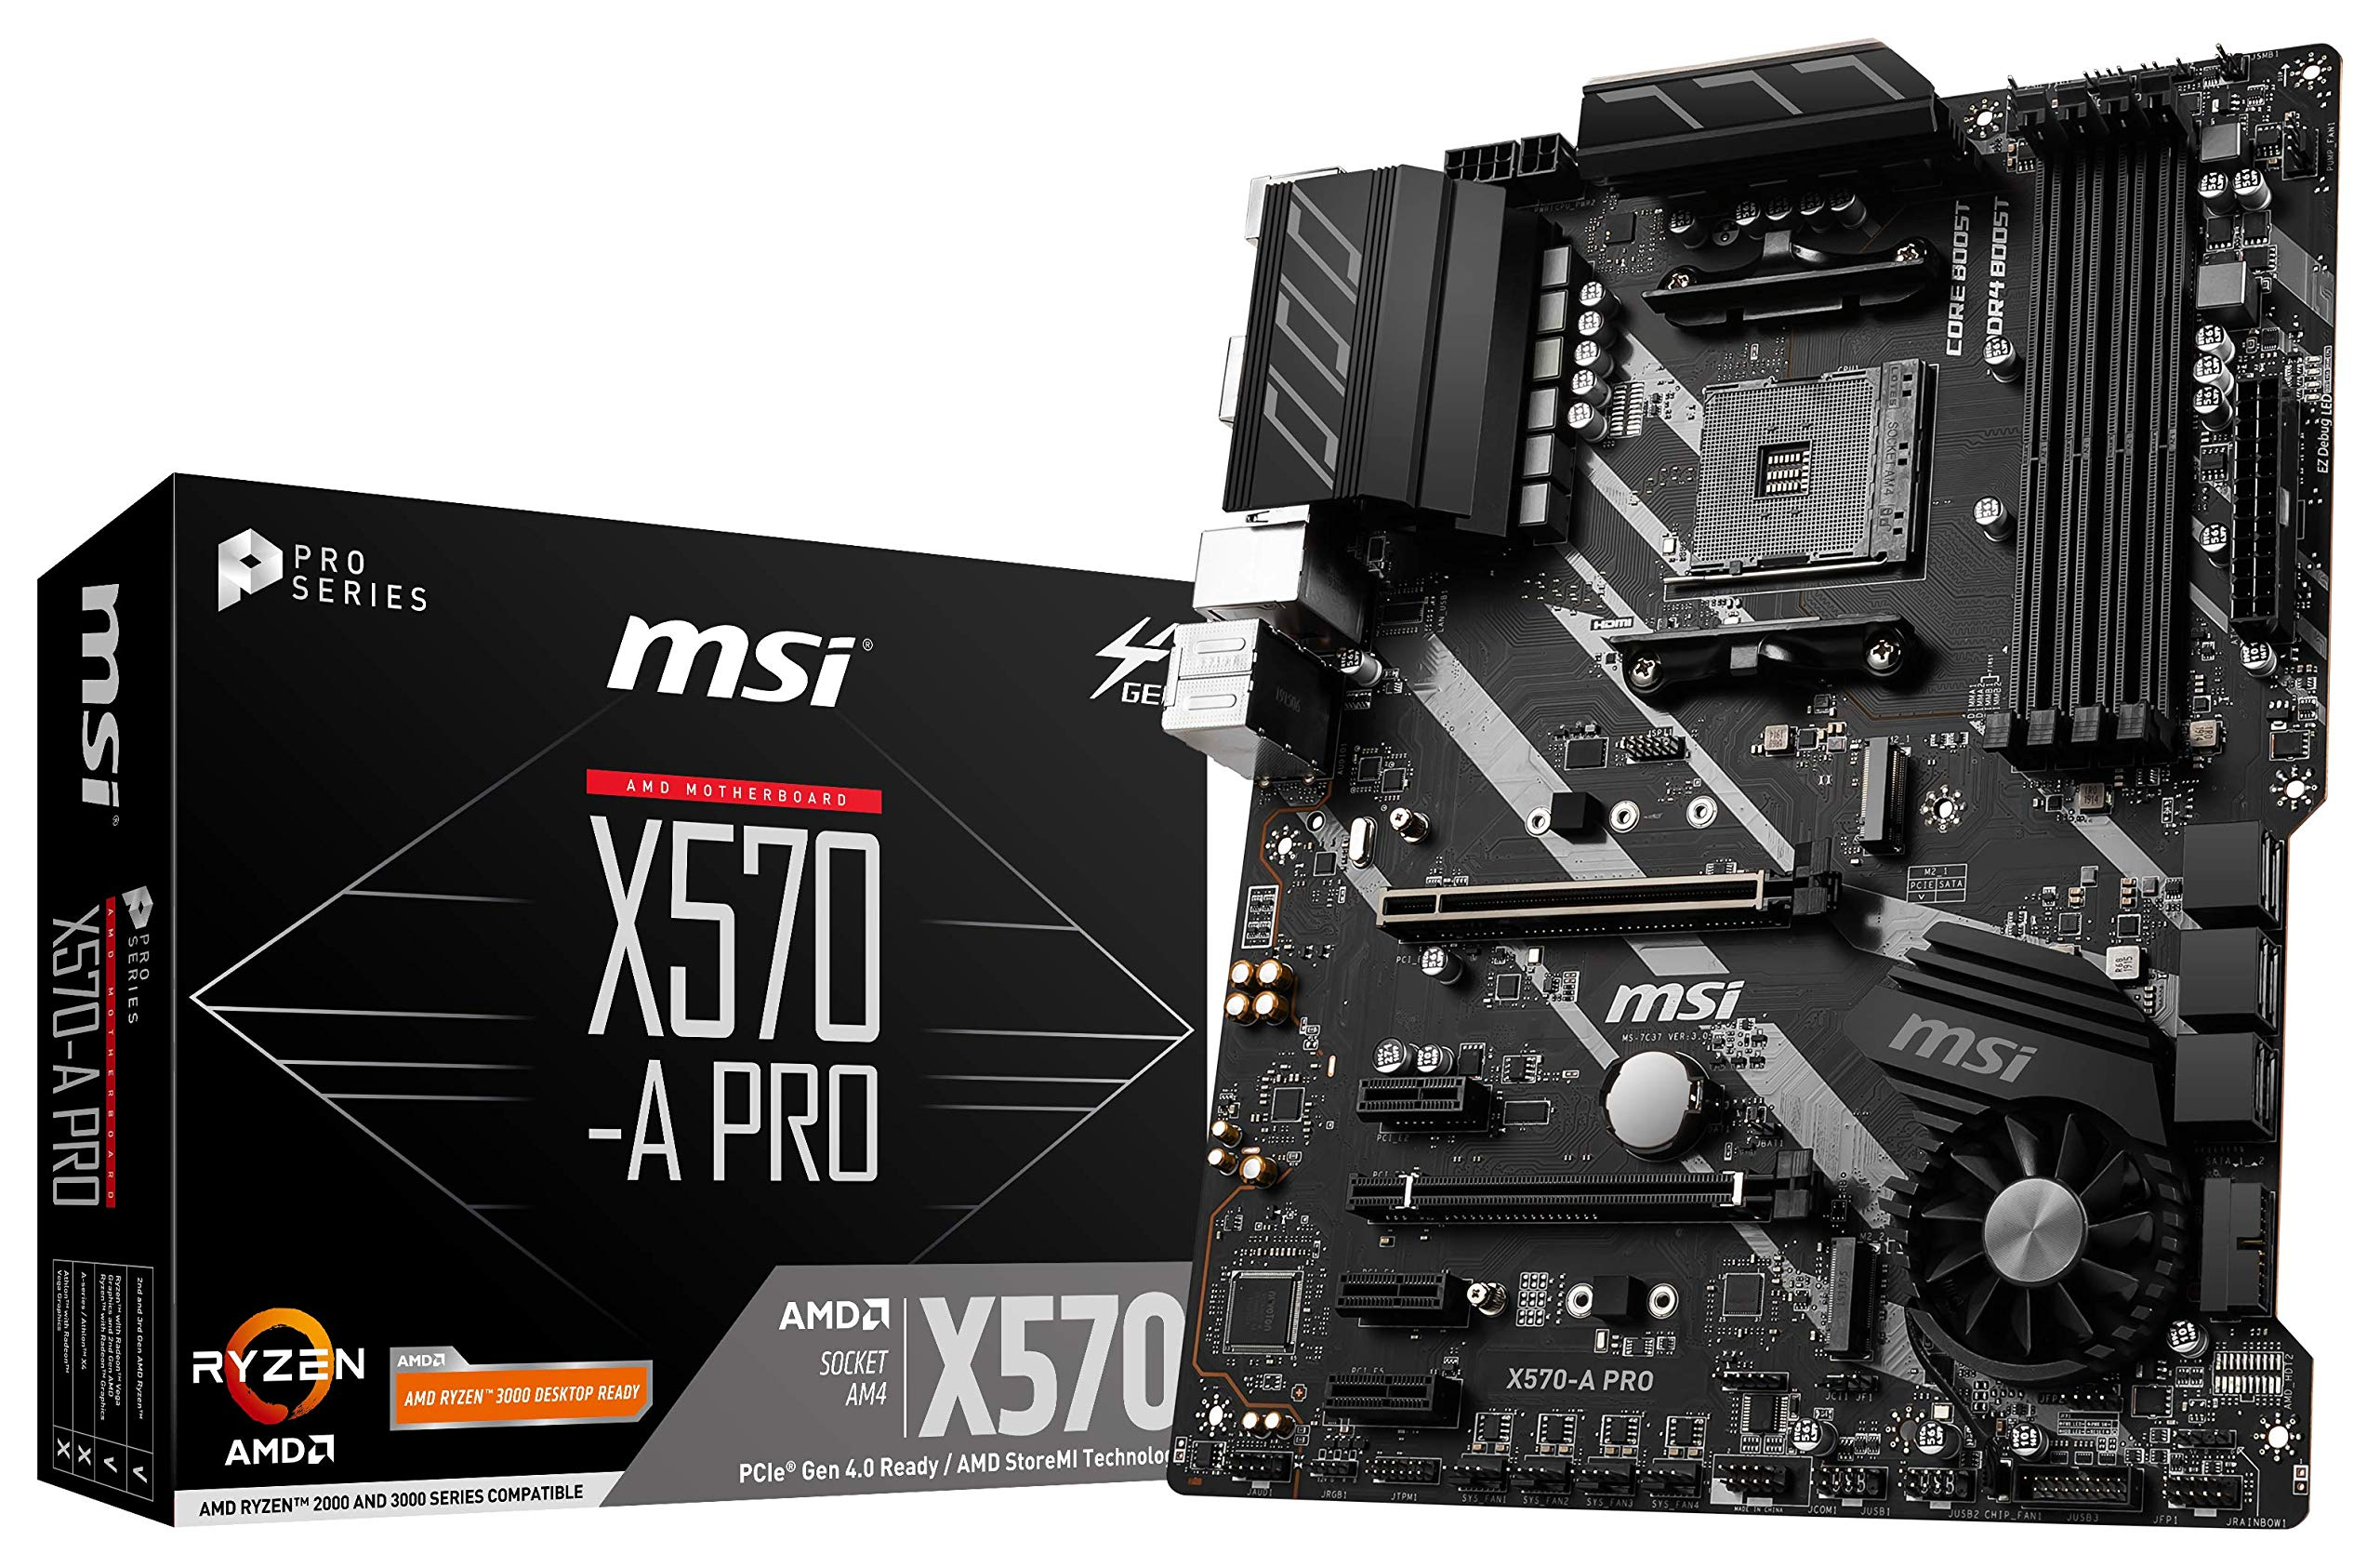 MSI X570-A PRO Motherboard (AMD AM4, DDR4, PCIe 4.0, SATA 6Gb/s, M.2, USB 3.2 Gen 2, HDMI, ATX) by MSI